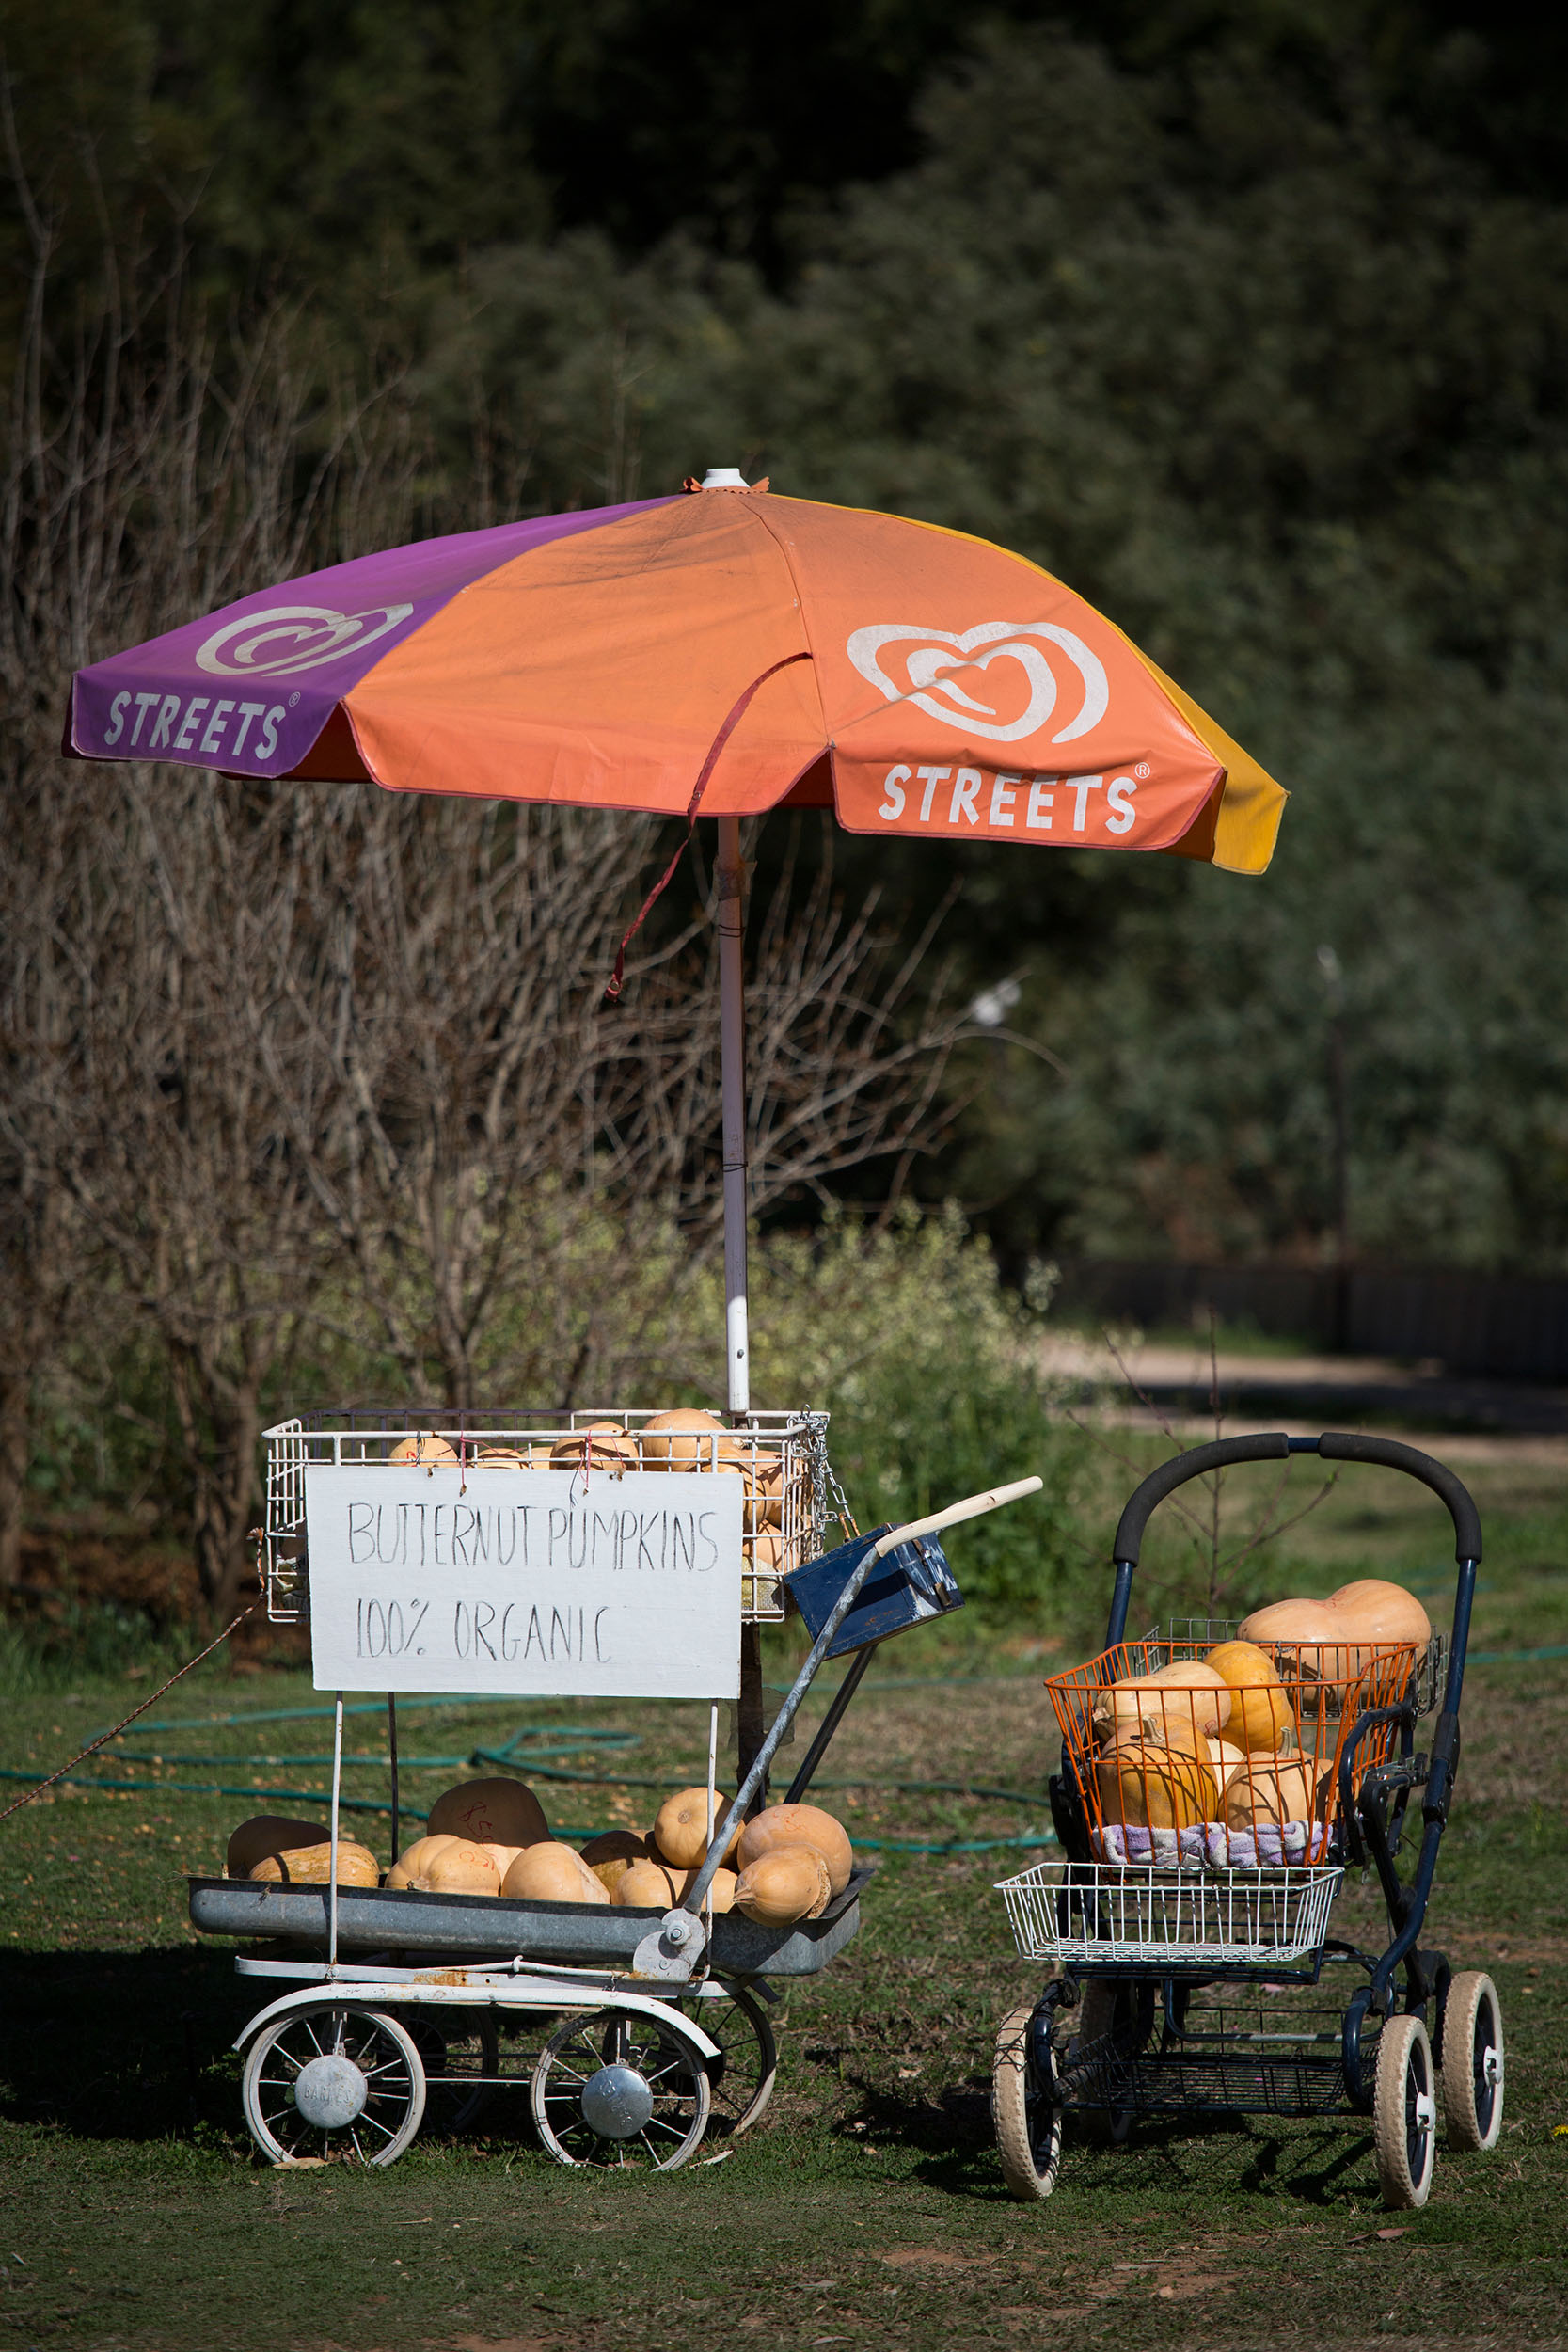 Roadside stall selling pumpkins, Mildura, Victoria.